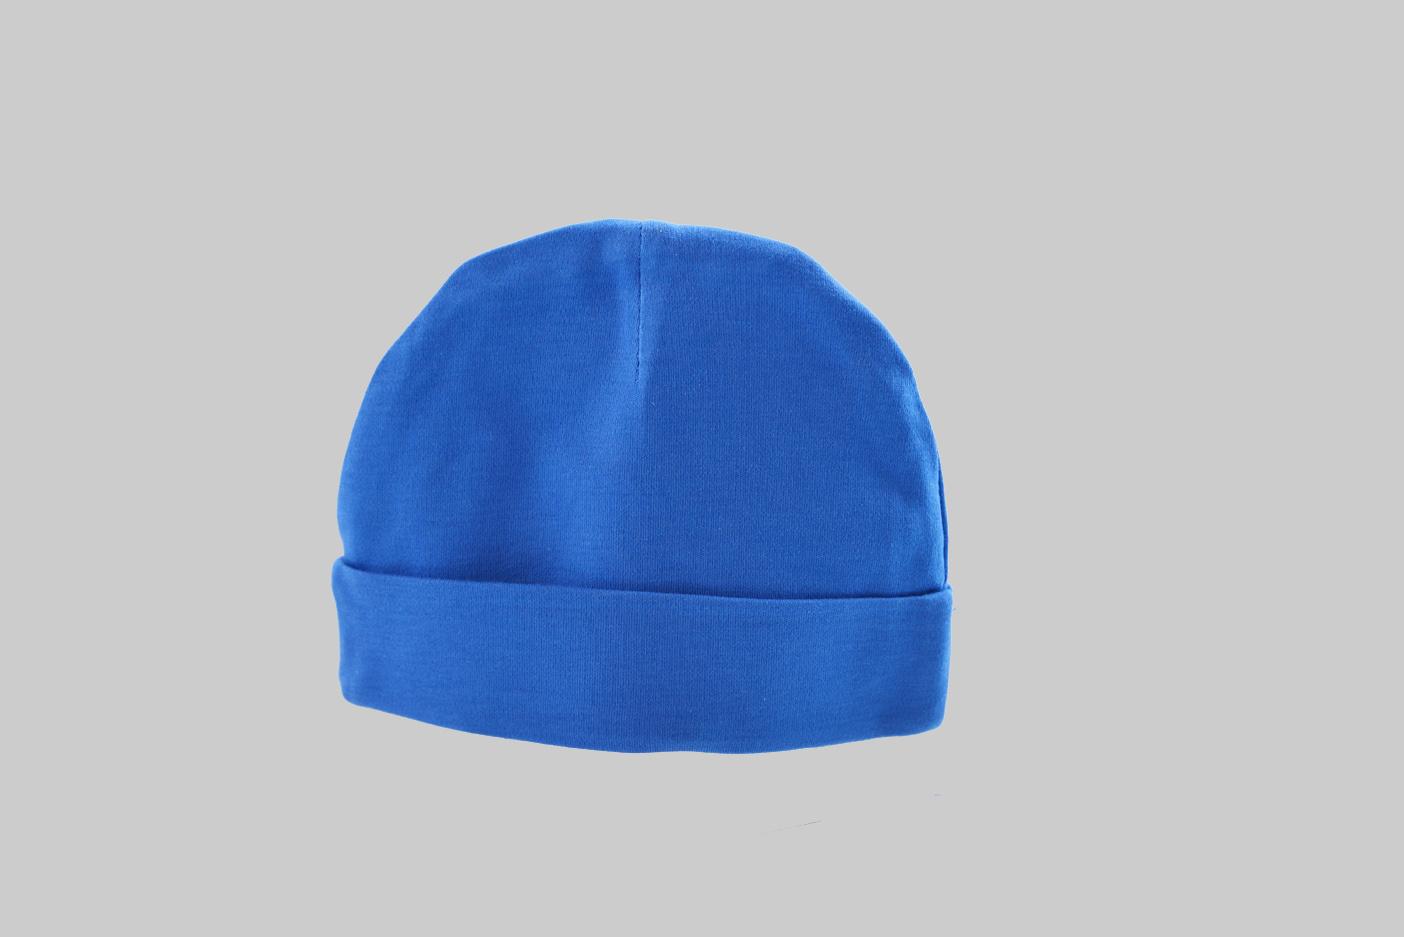 Royal Blue color baby cap